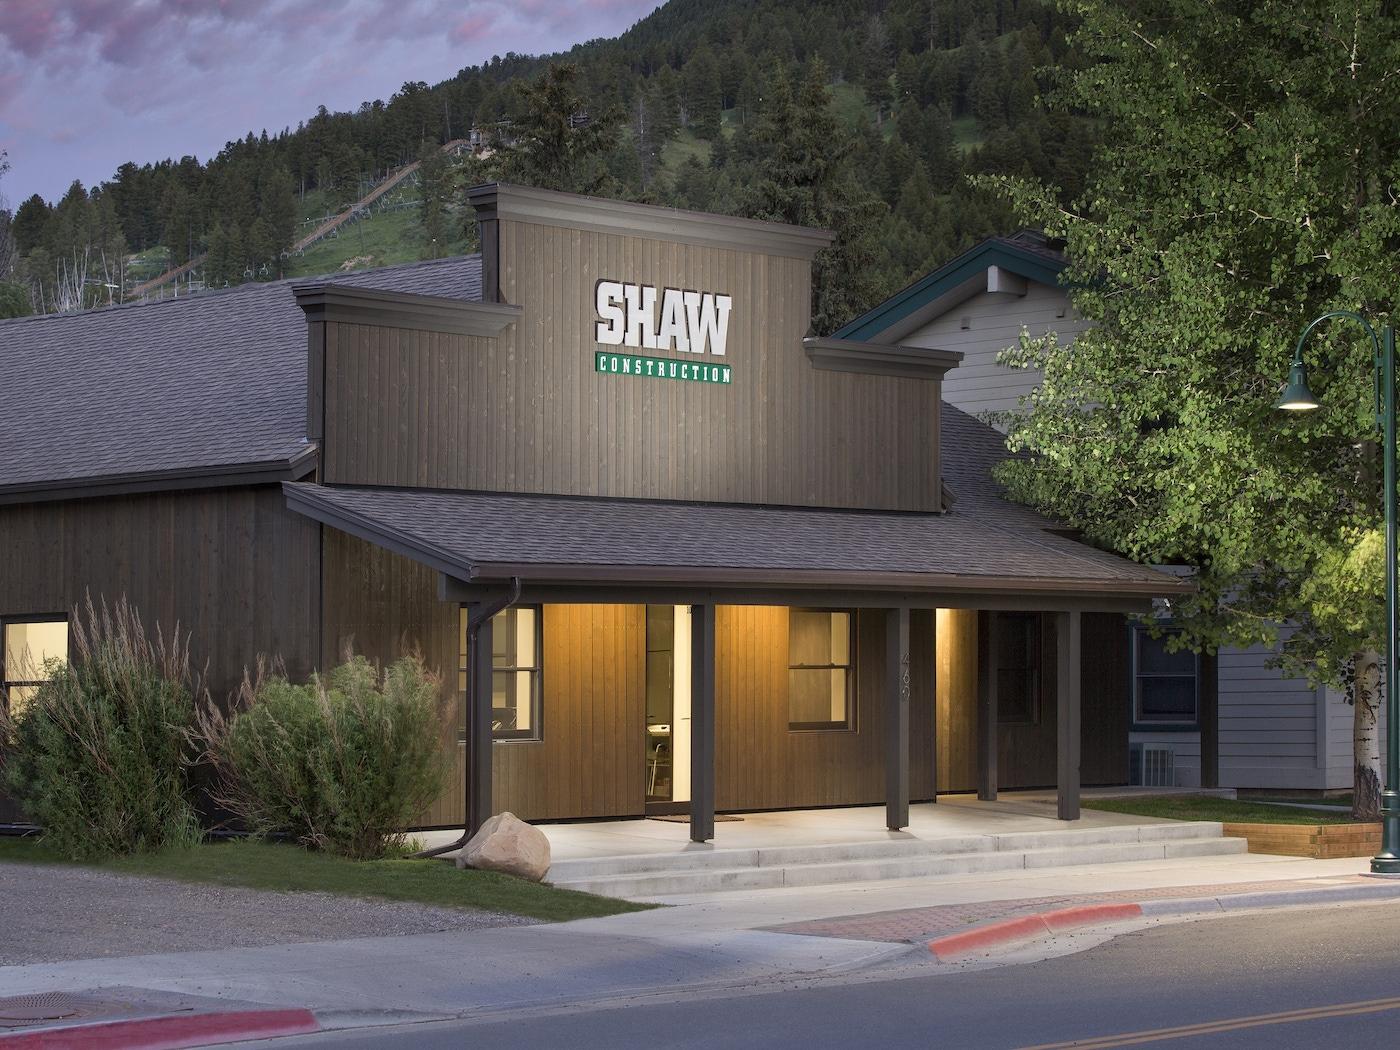 2002 Shaw Wyoming